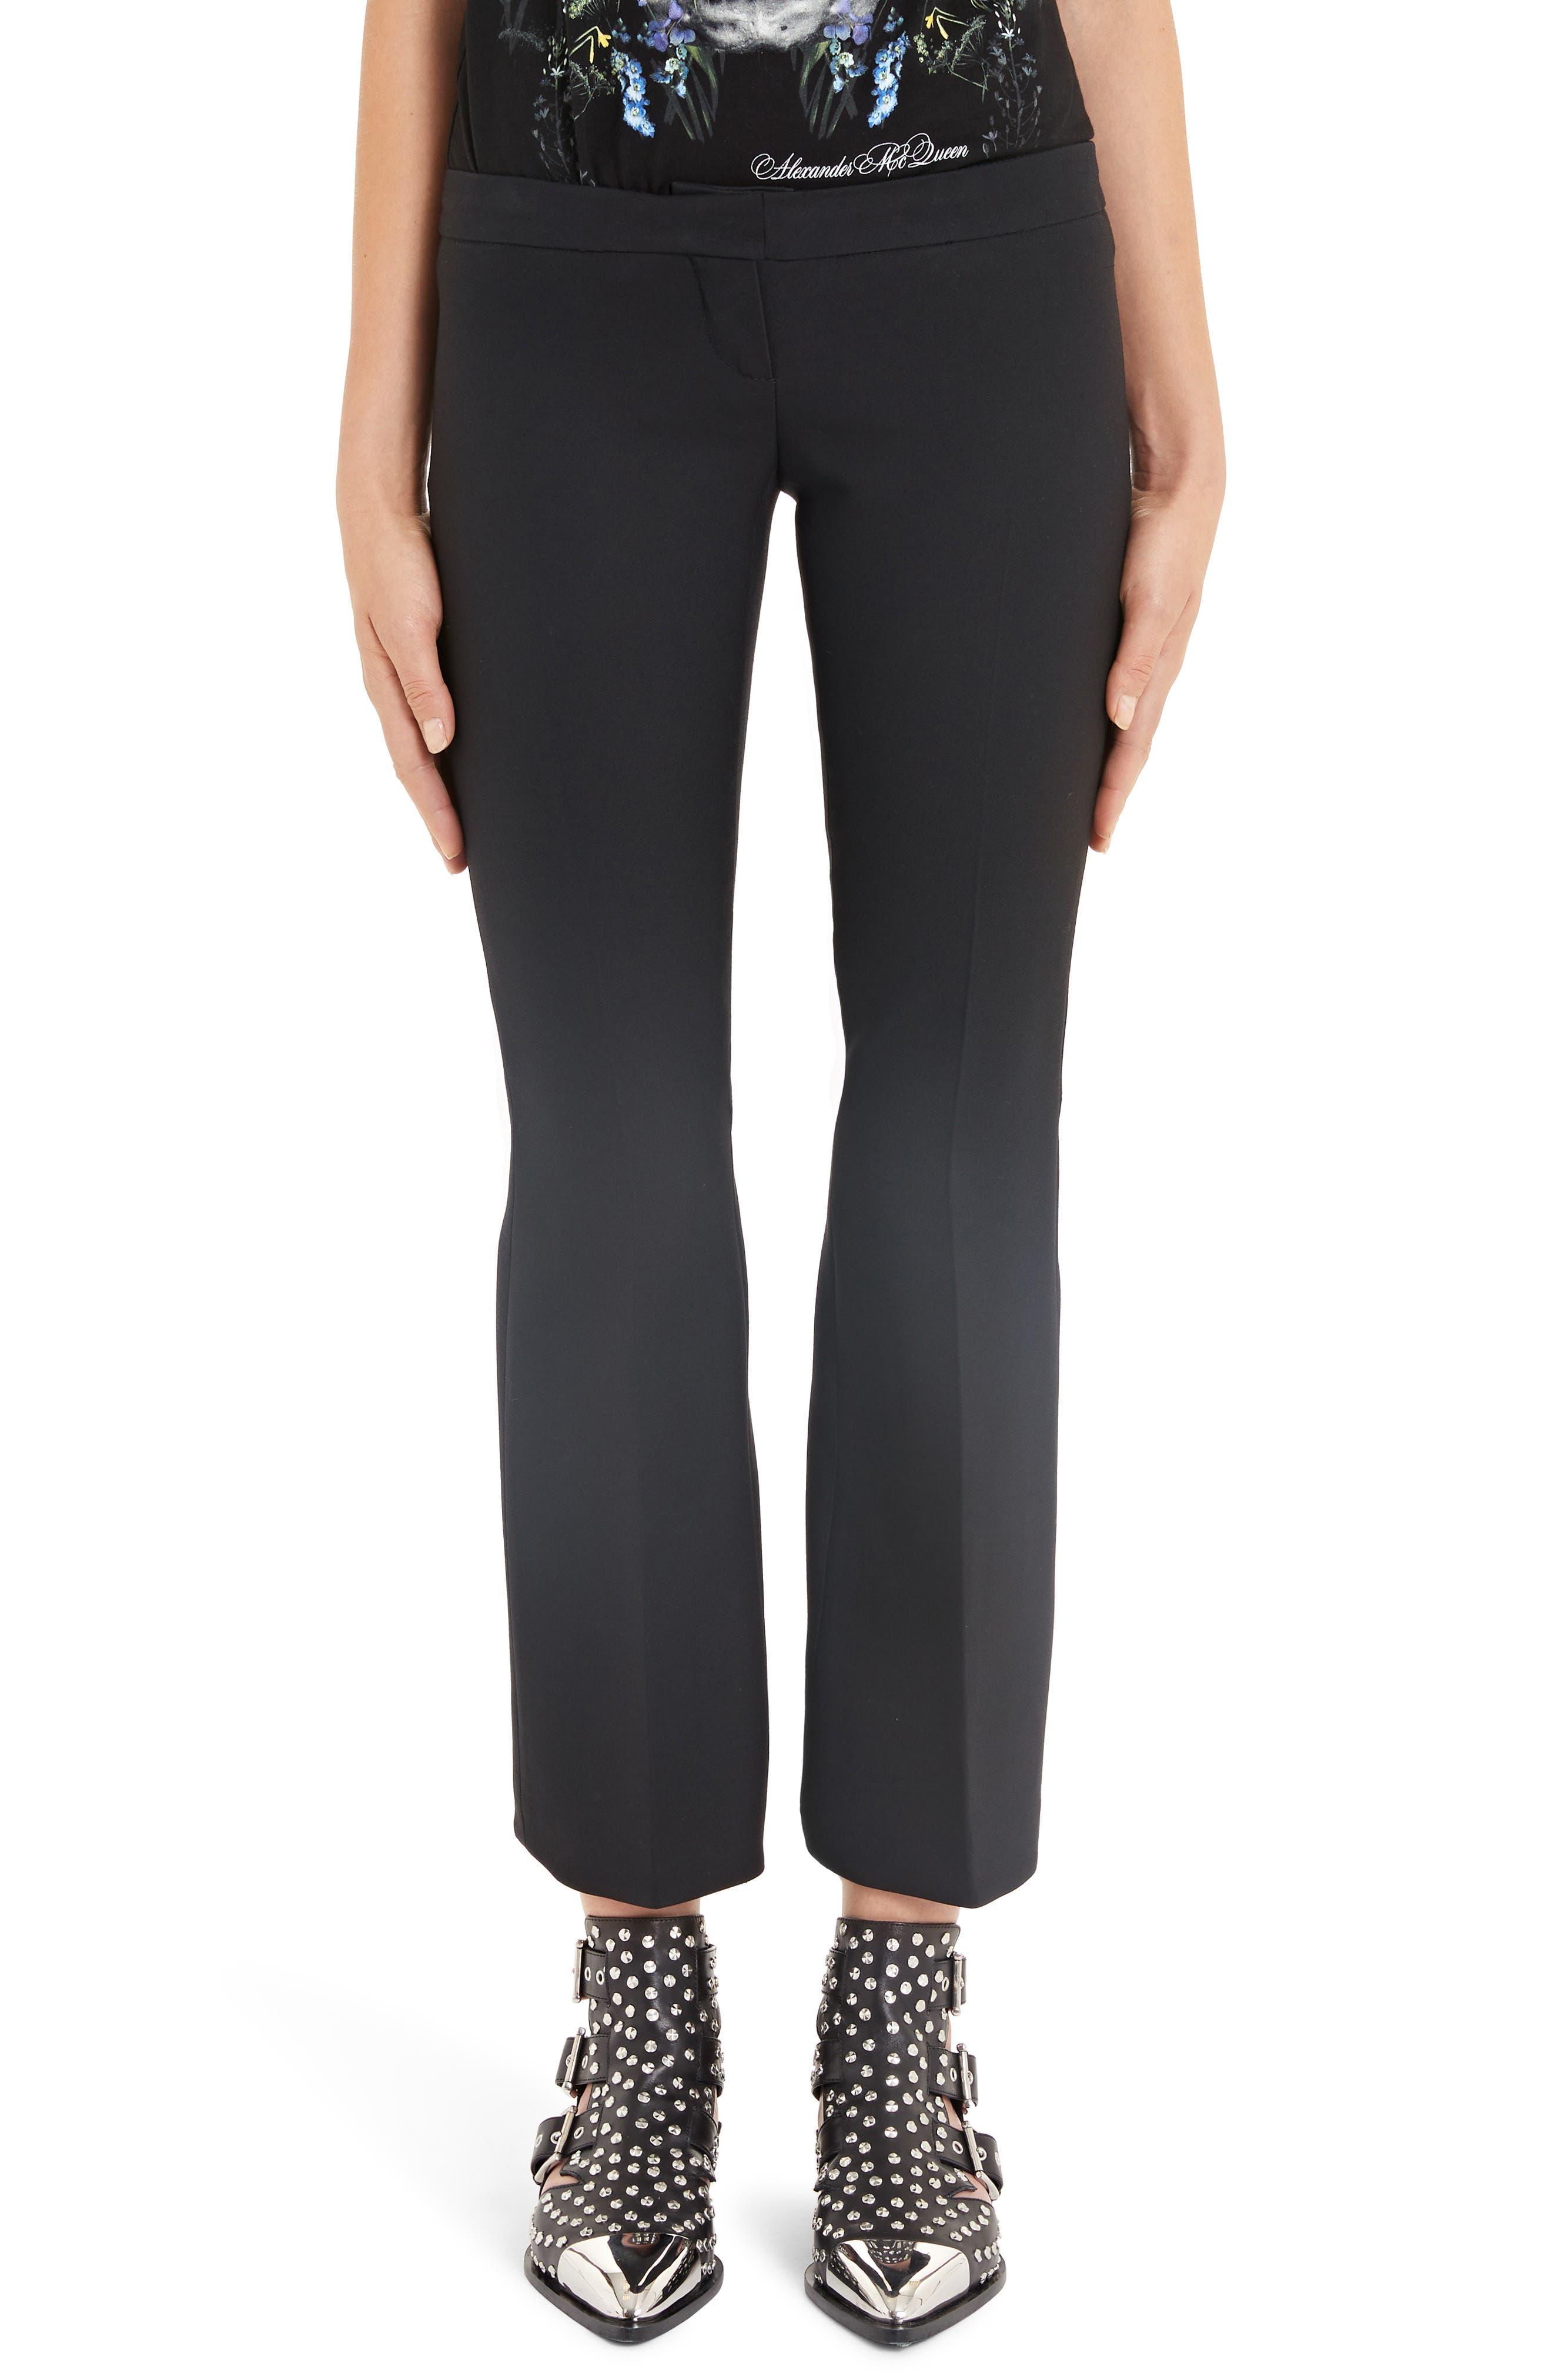 Alexander Mcqueen Pleated Crop Flare Pants, 8 IT - Black